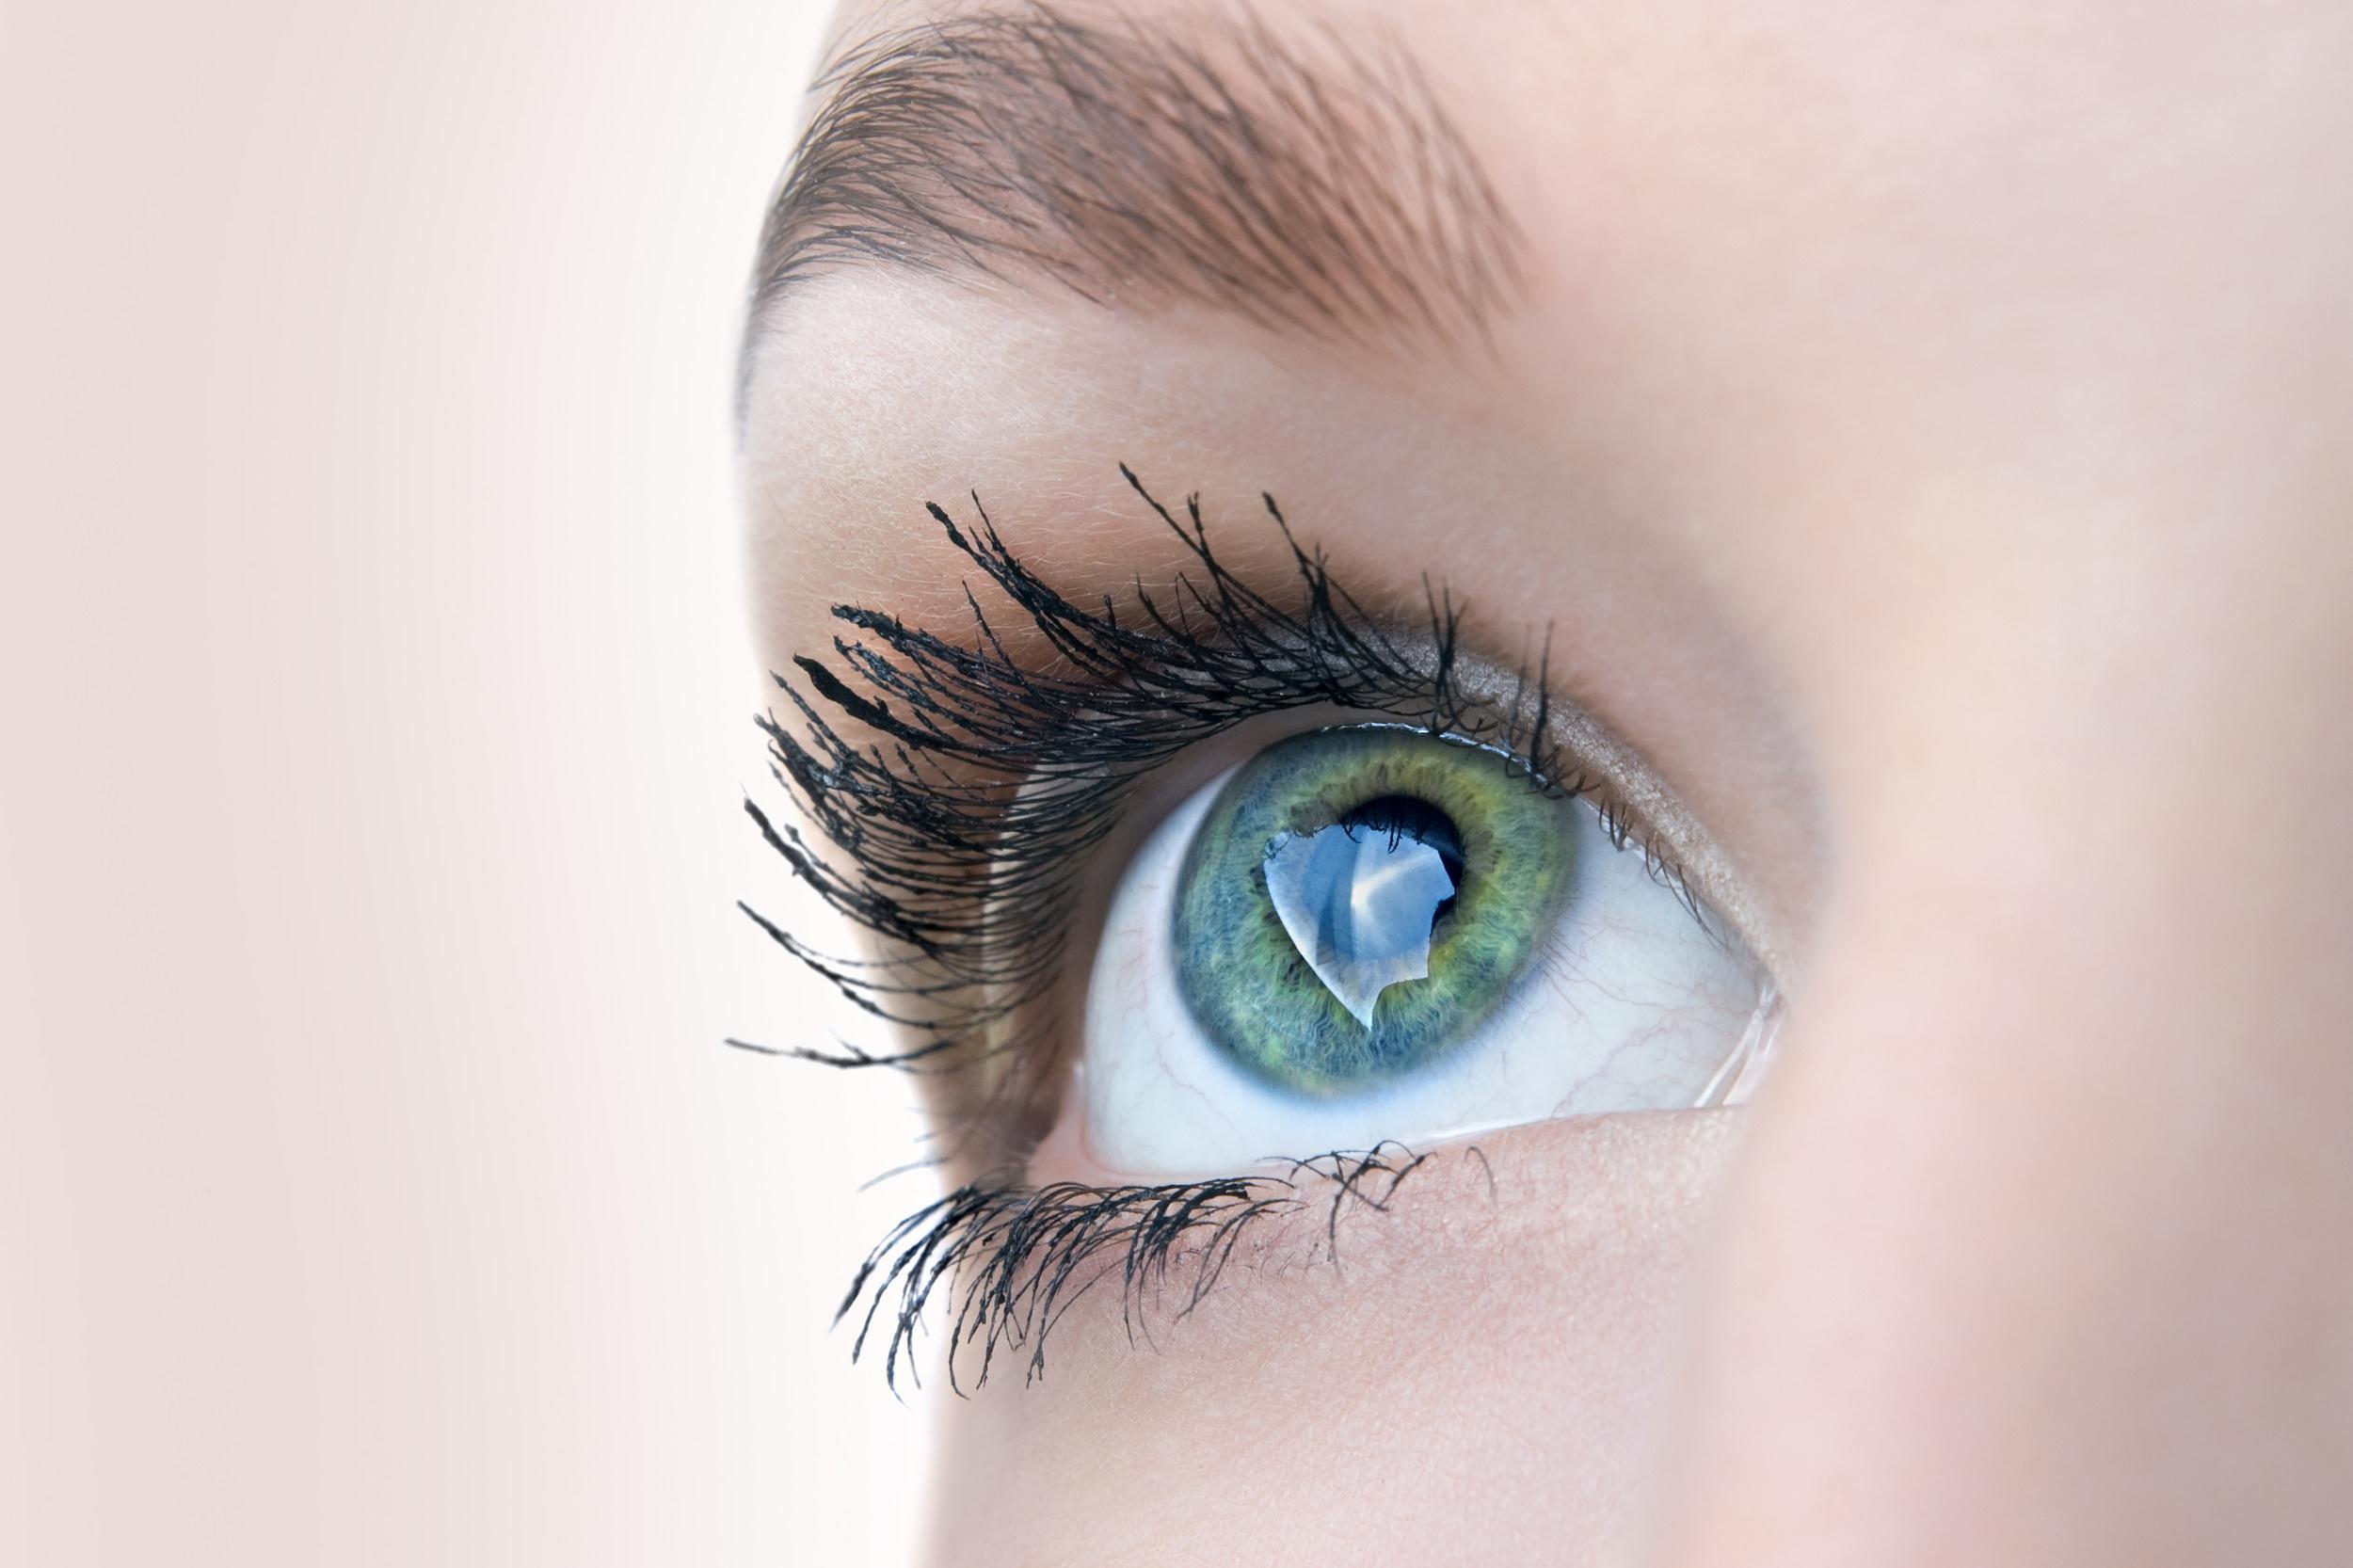 Avon is recalling eyelash curlers that could break and cause eye injuries.